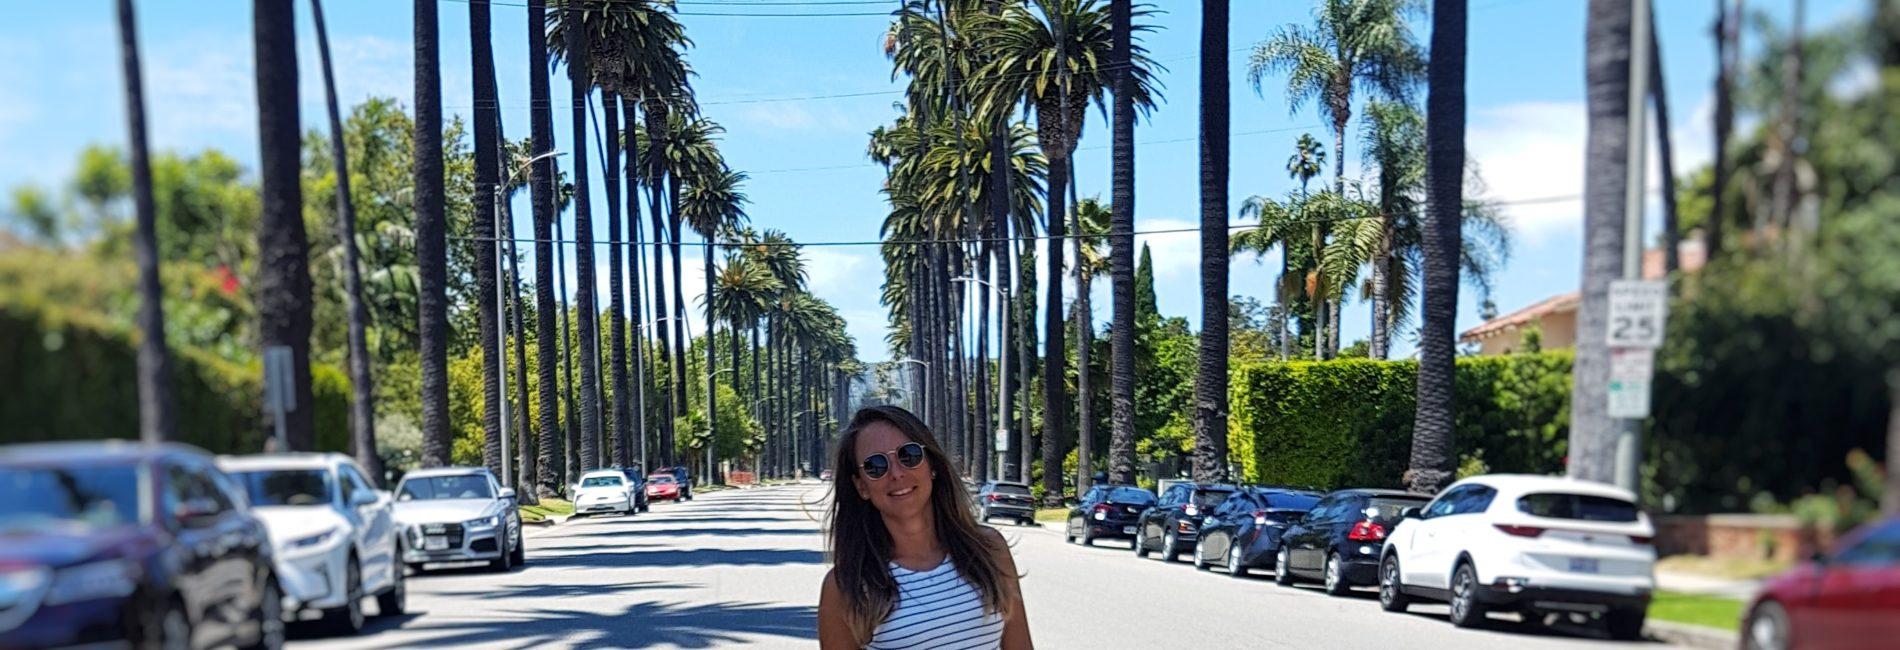 Roadtrip por California